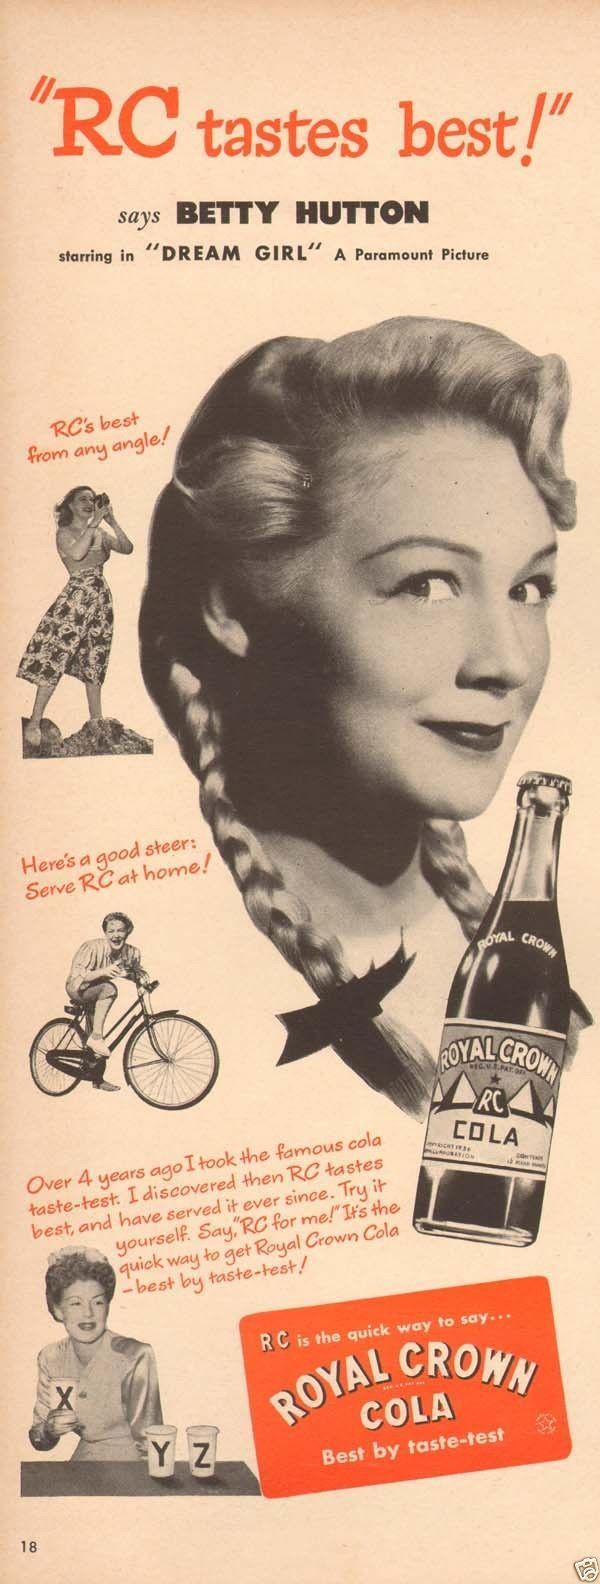 Betty hutton royal crown cola circa 1940s